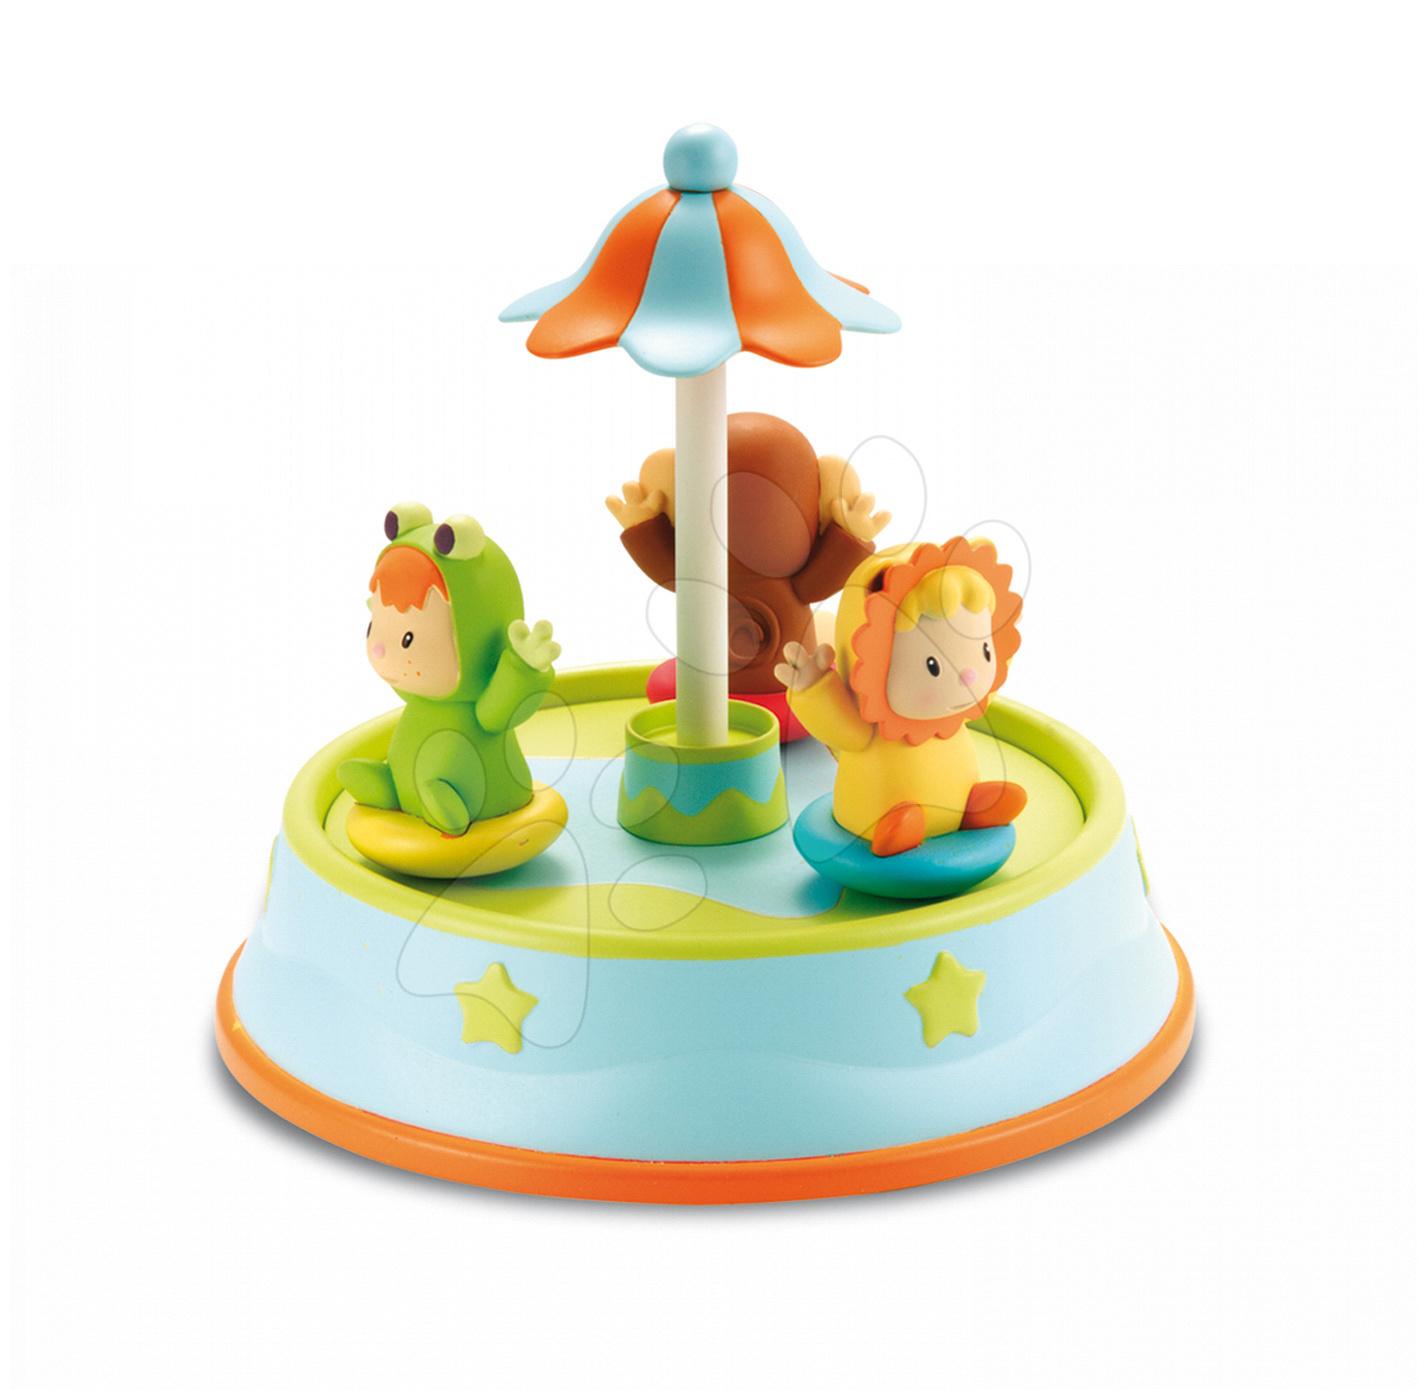 Vrtiljak Cotoons Merry Smoby s plešočimi figuricami in melodijami od 12 mes